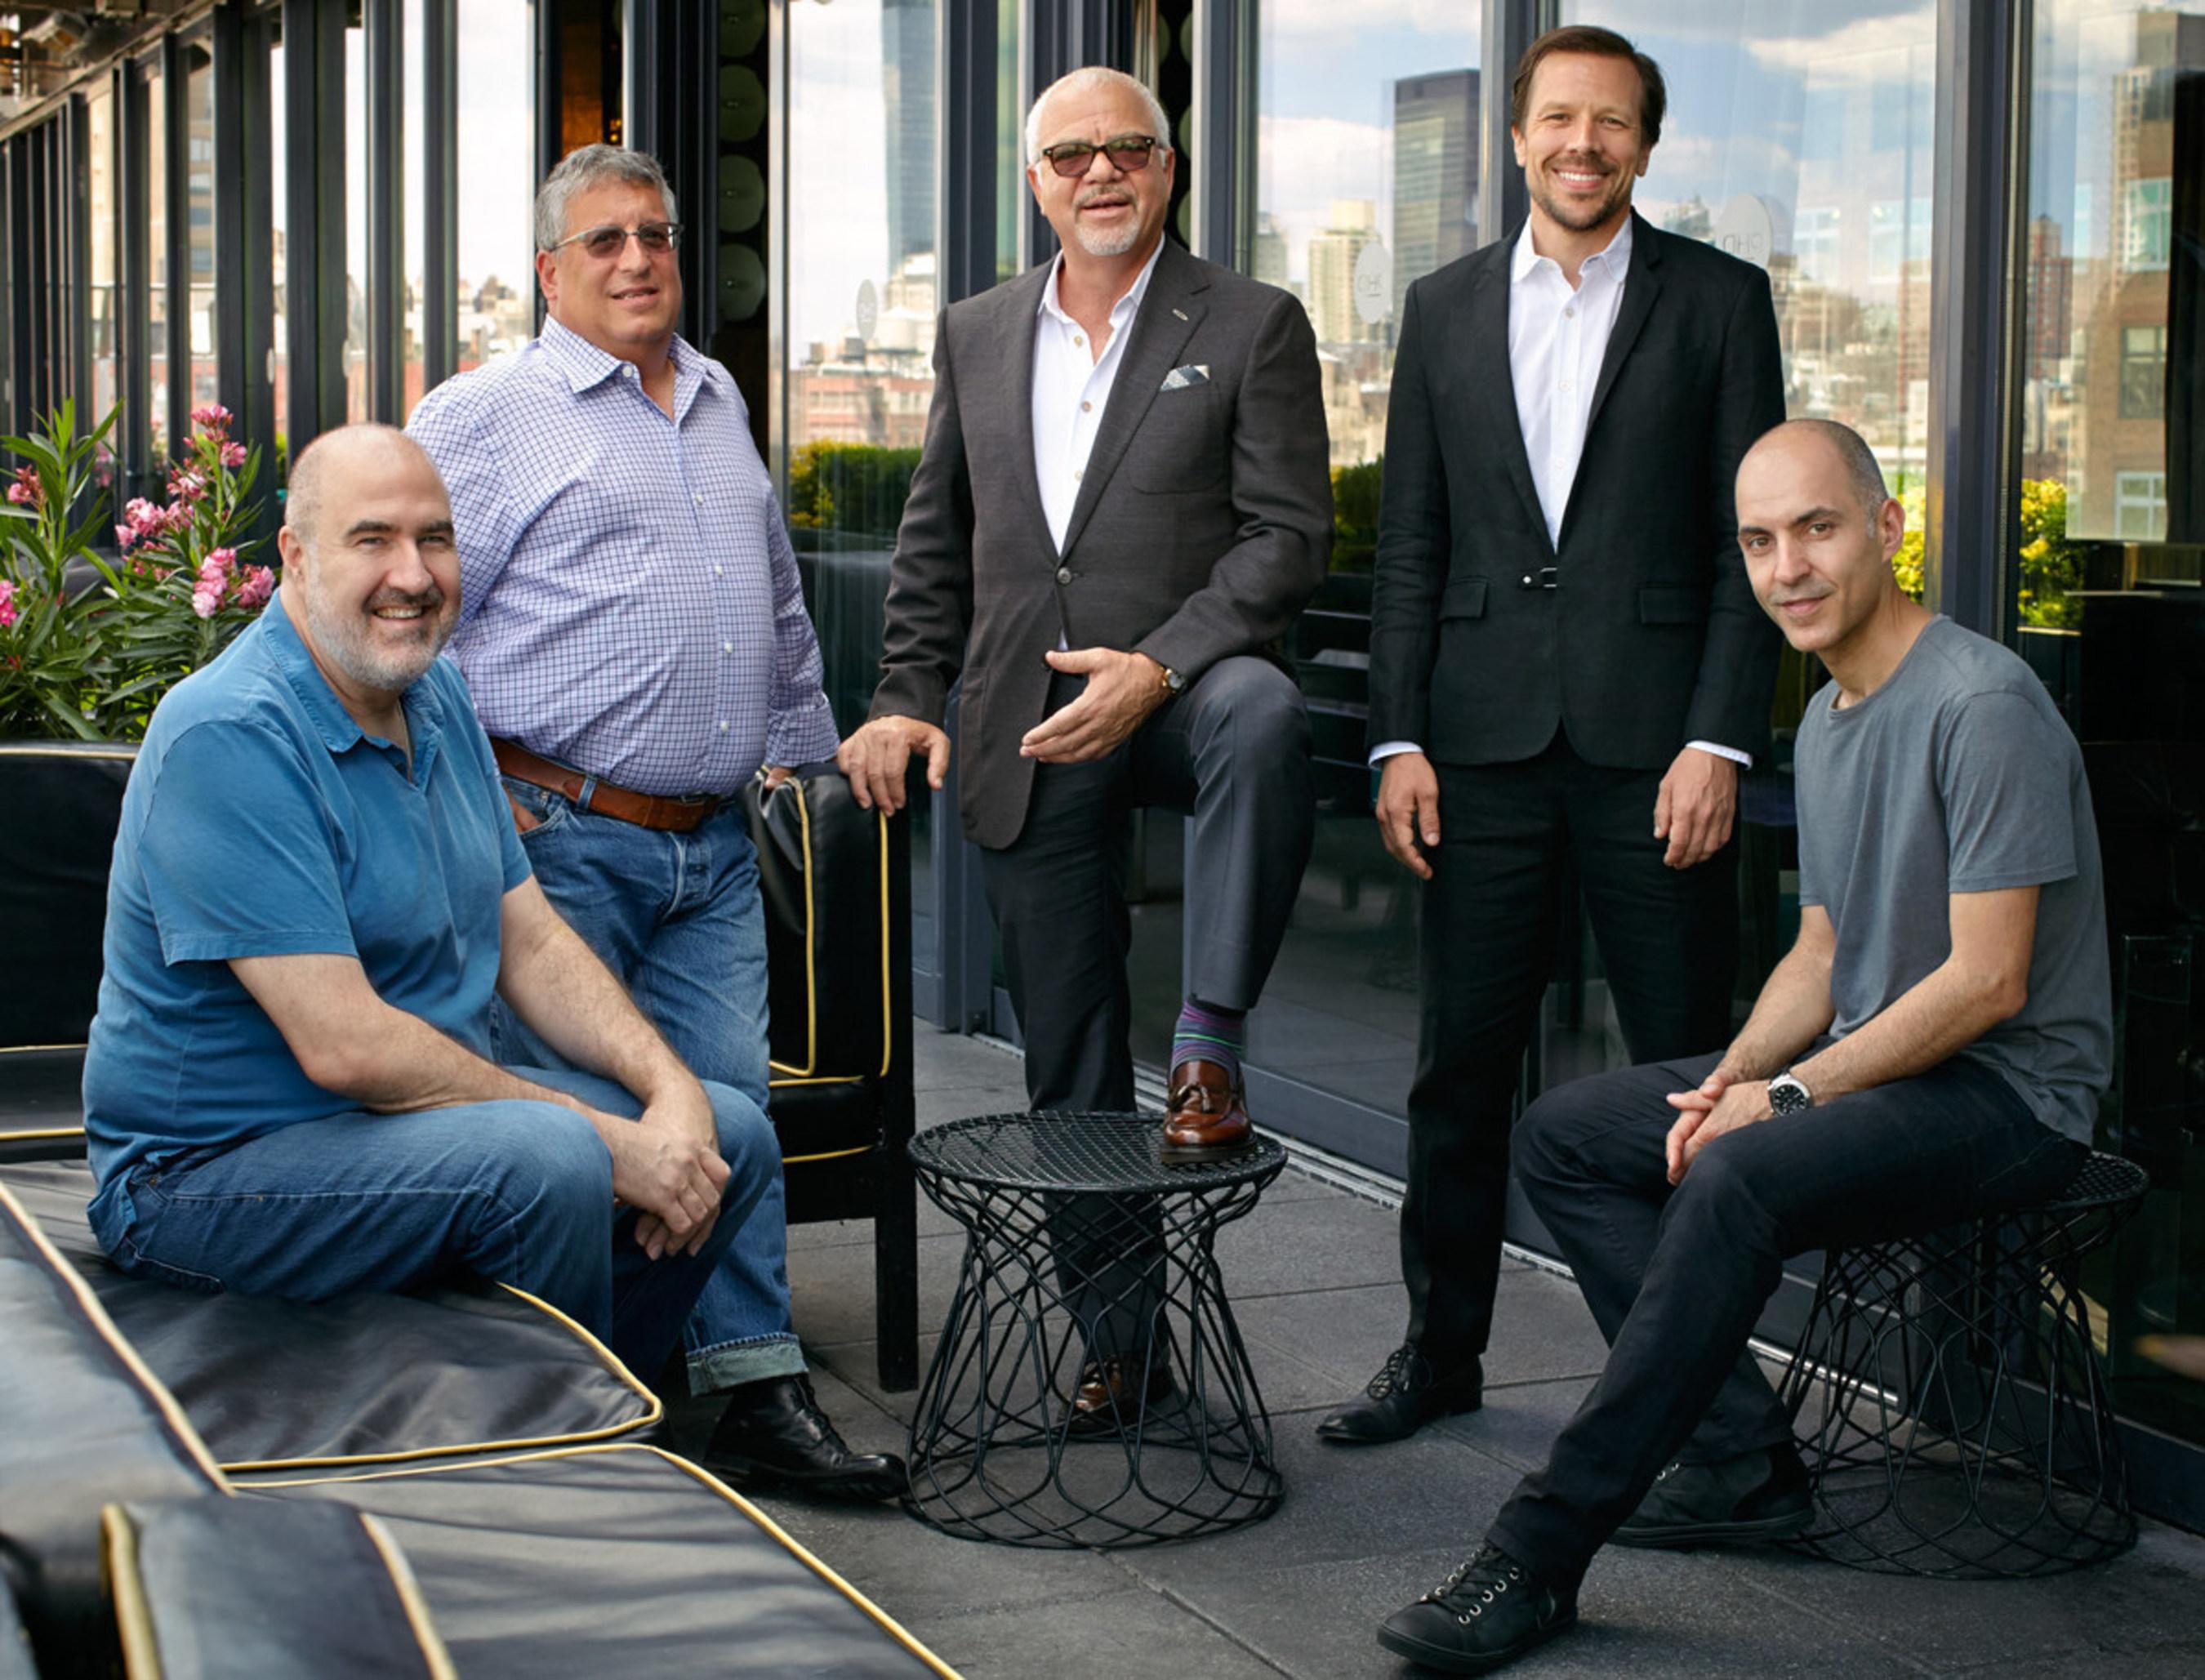 Paradigm Music Division, Left to Right: Chip Hooper, Marty Diamond, Sam Gores, Tom Windish, Paul Morris